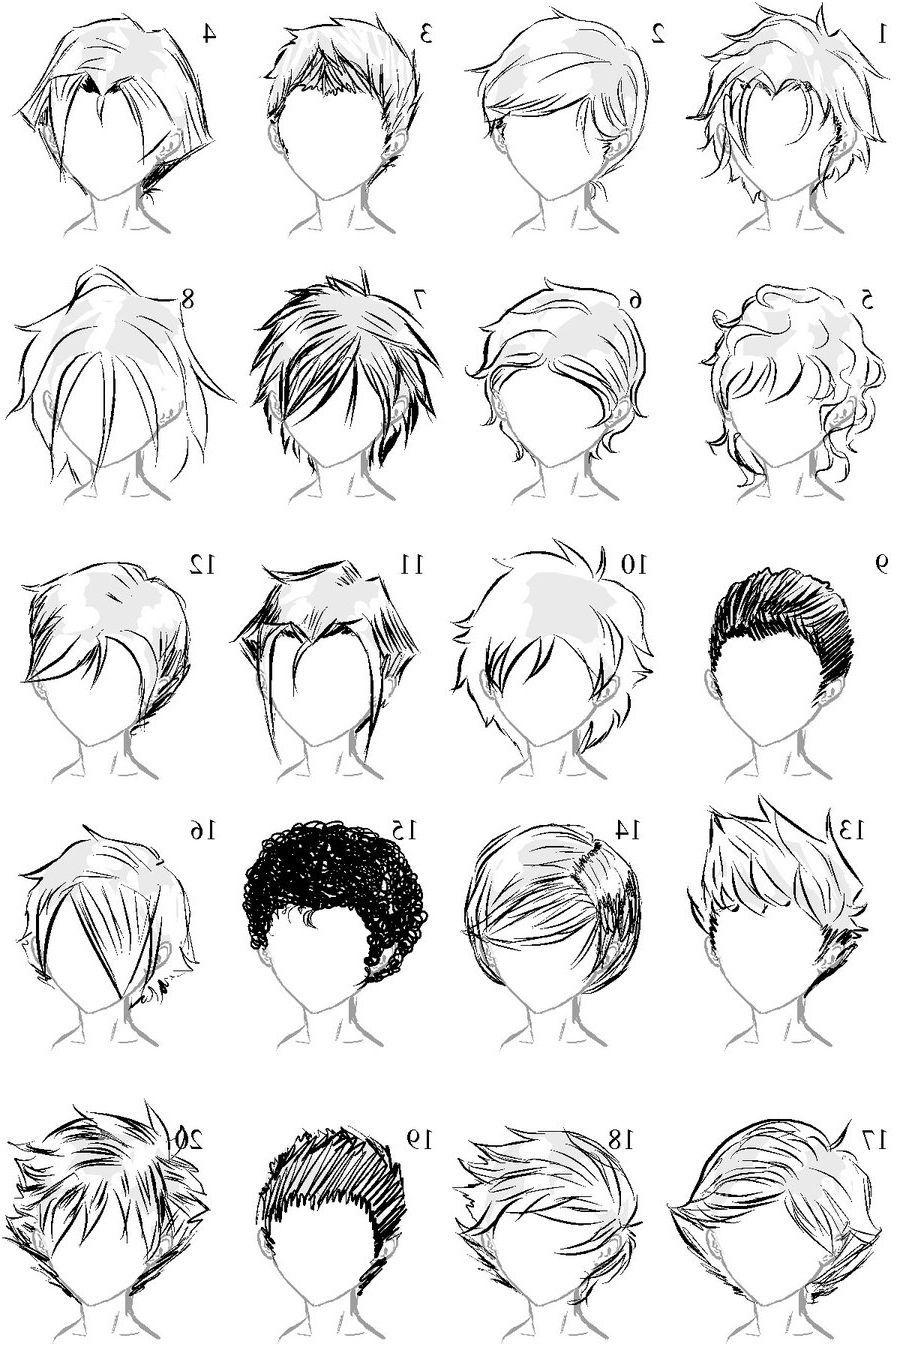 Curly Anime Male Hairstyles Anime Boy Hair Manga Hair Anime Hairstyles Male